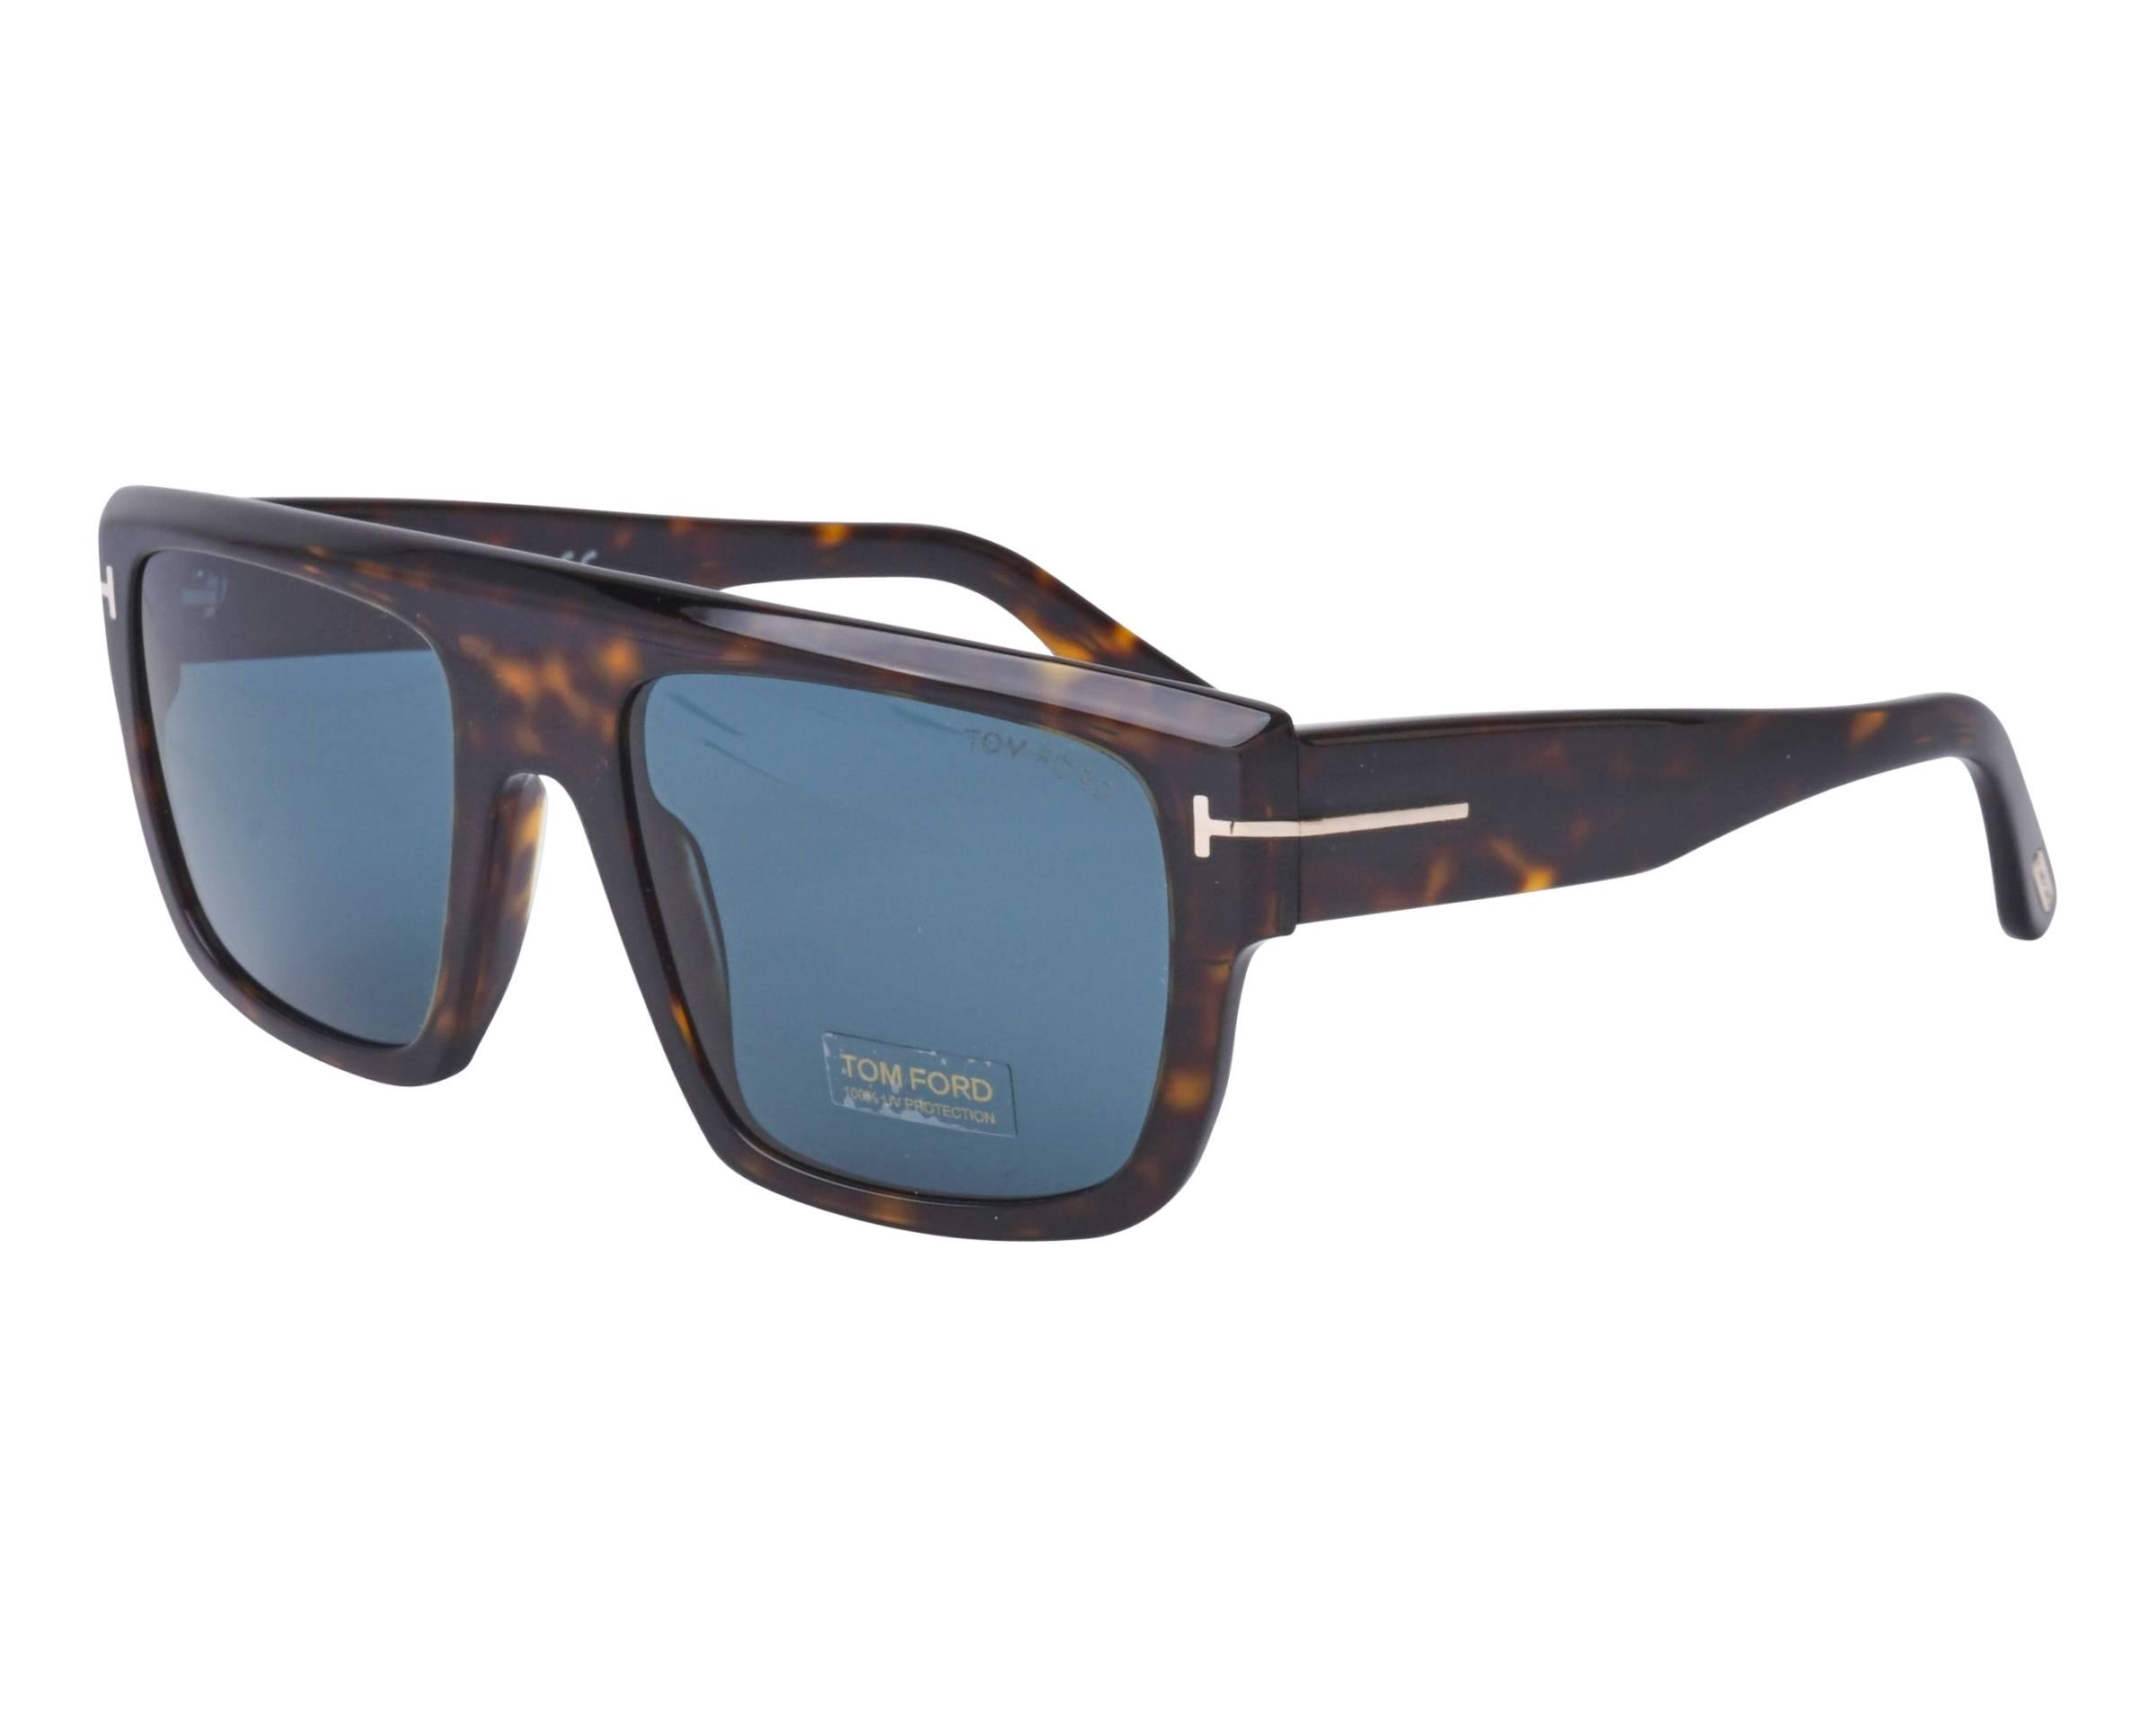 Sunglasses Tom Ford Alessio Ft 0699 S 52v